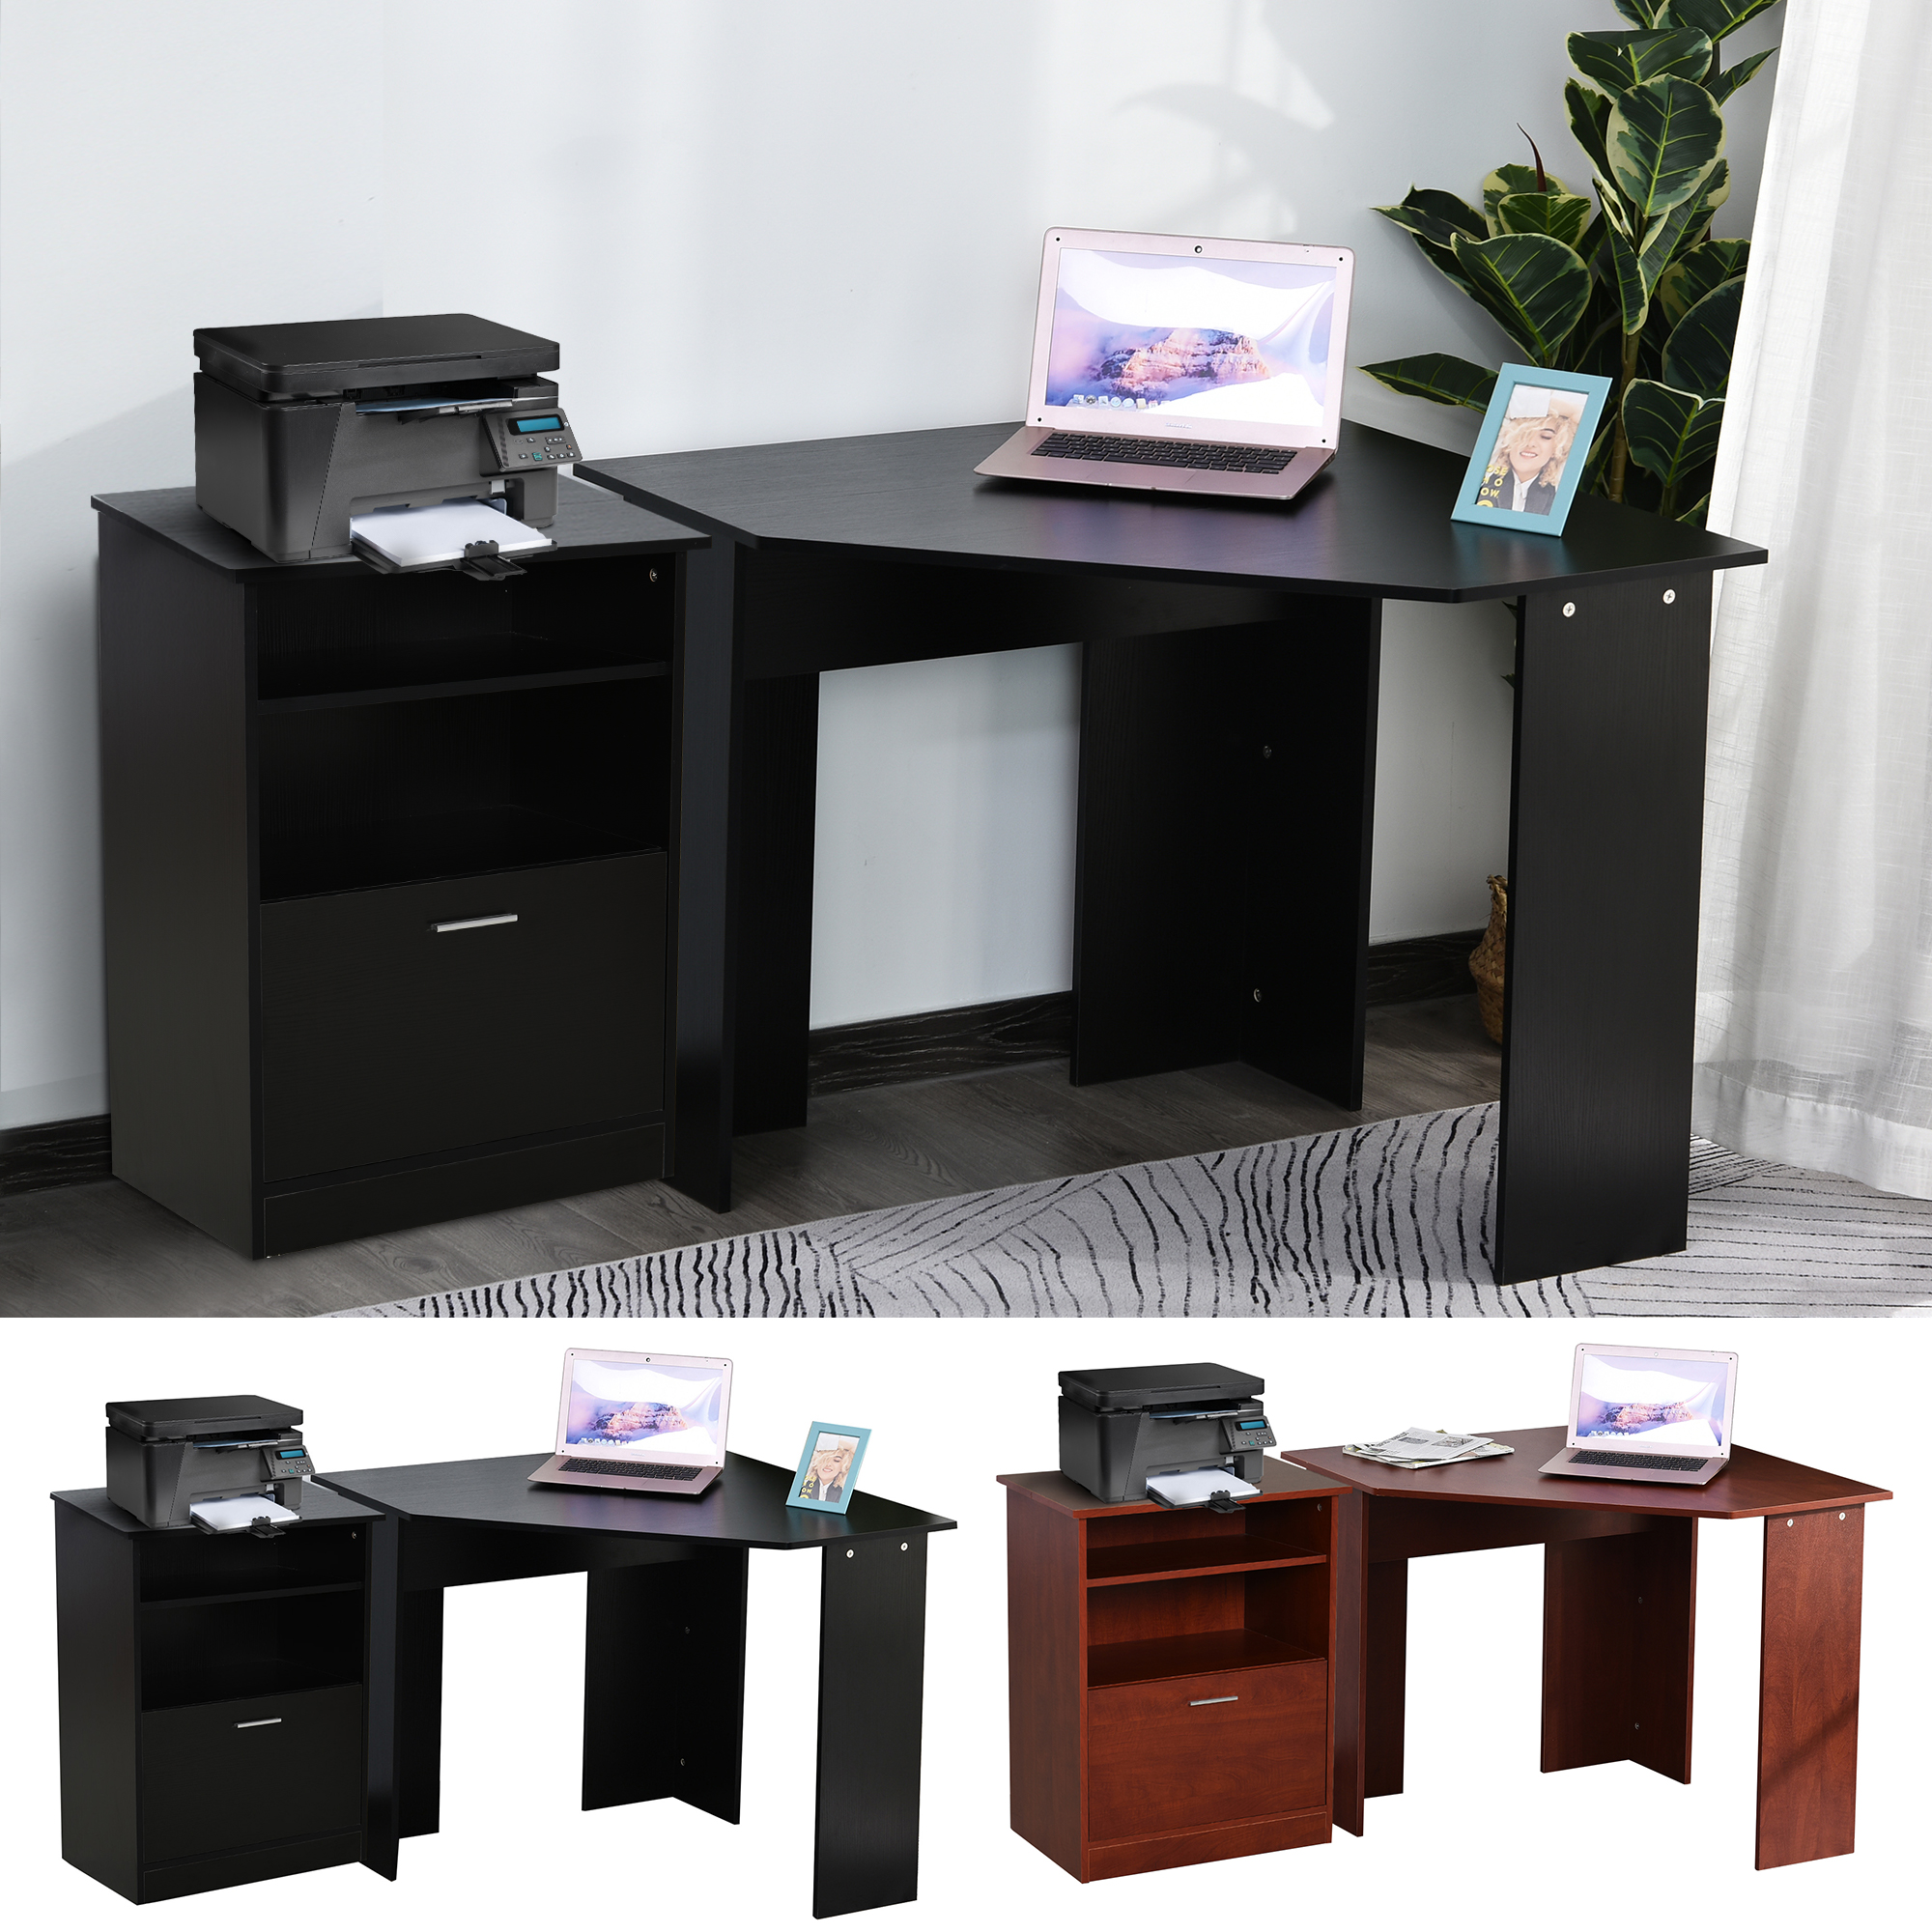 Details about HOMCOM Computer Desk w/ Printer Cabinet L-Shape Corner Table  PC Laptop Desk